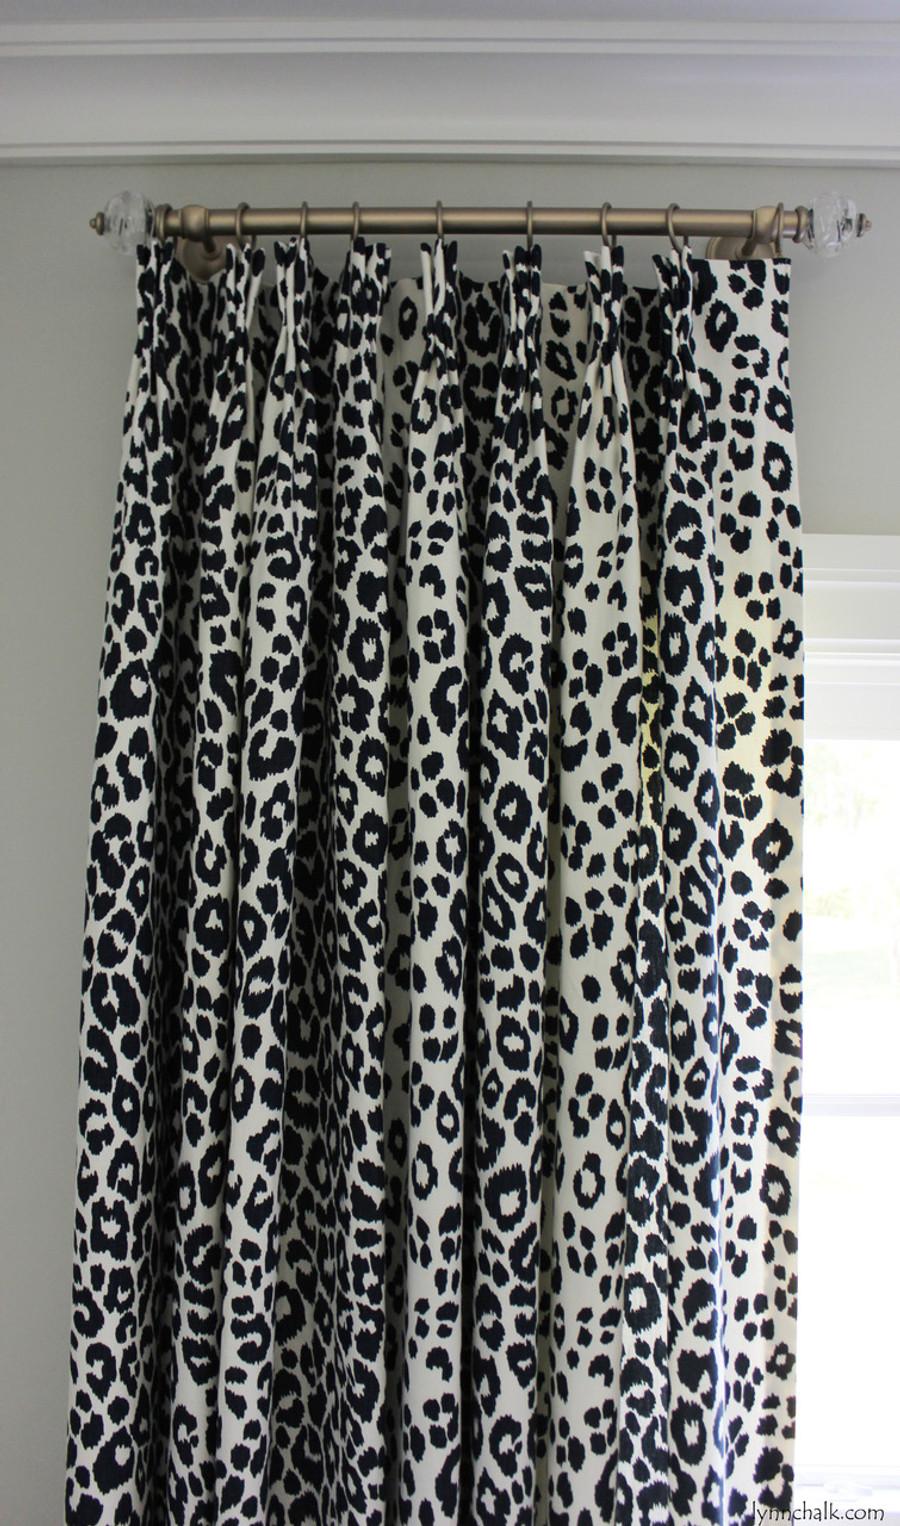 Custom Pinch Pleated Drapes by Lynn Chalk in Schumacher Iconic Leopard in Ink